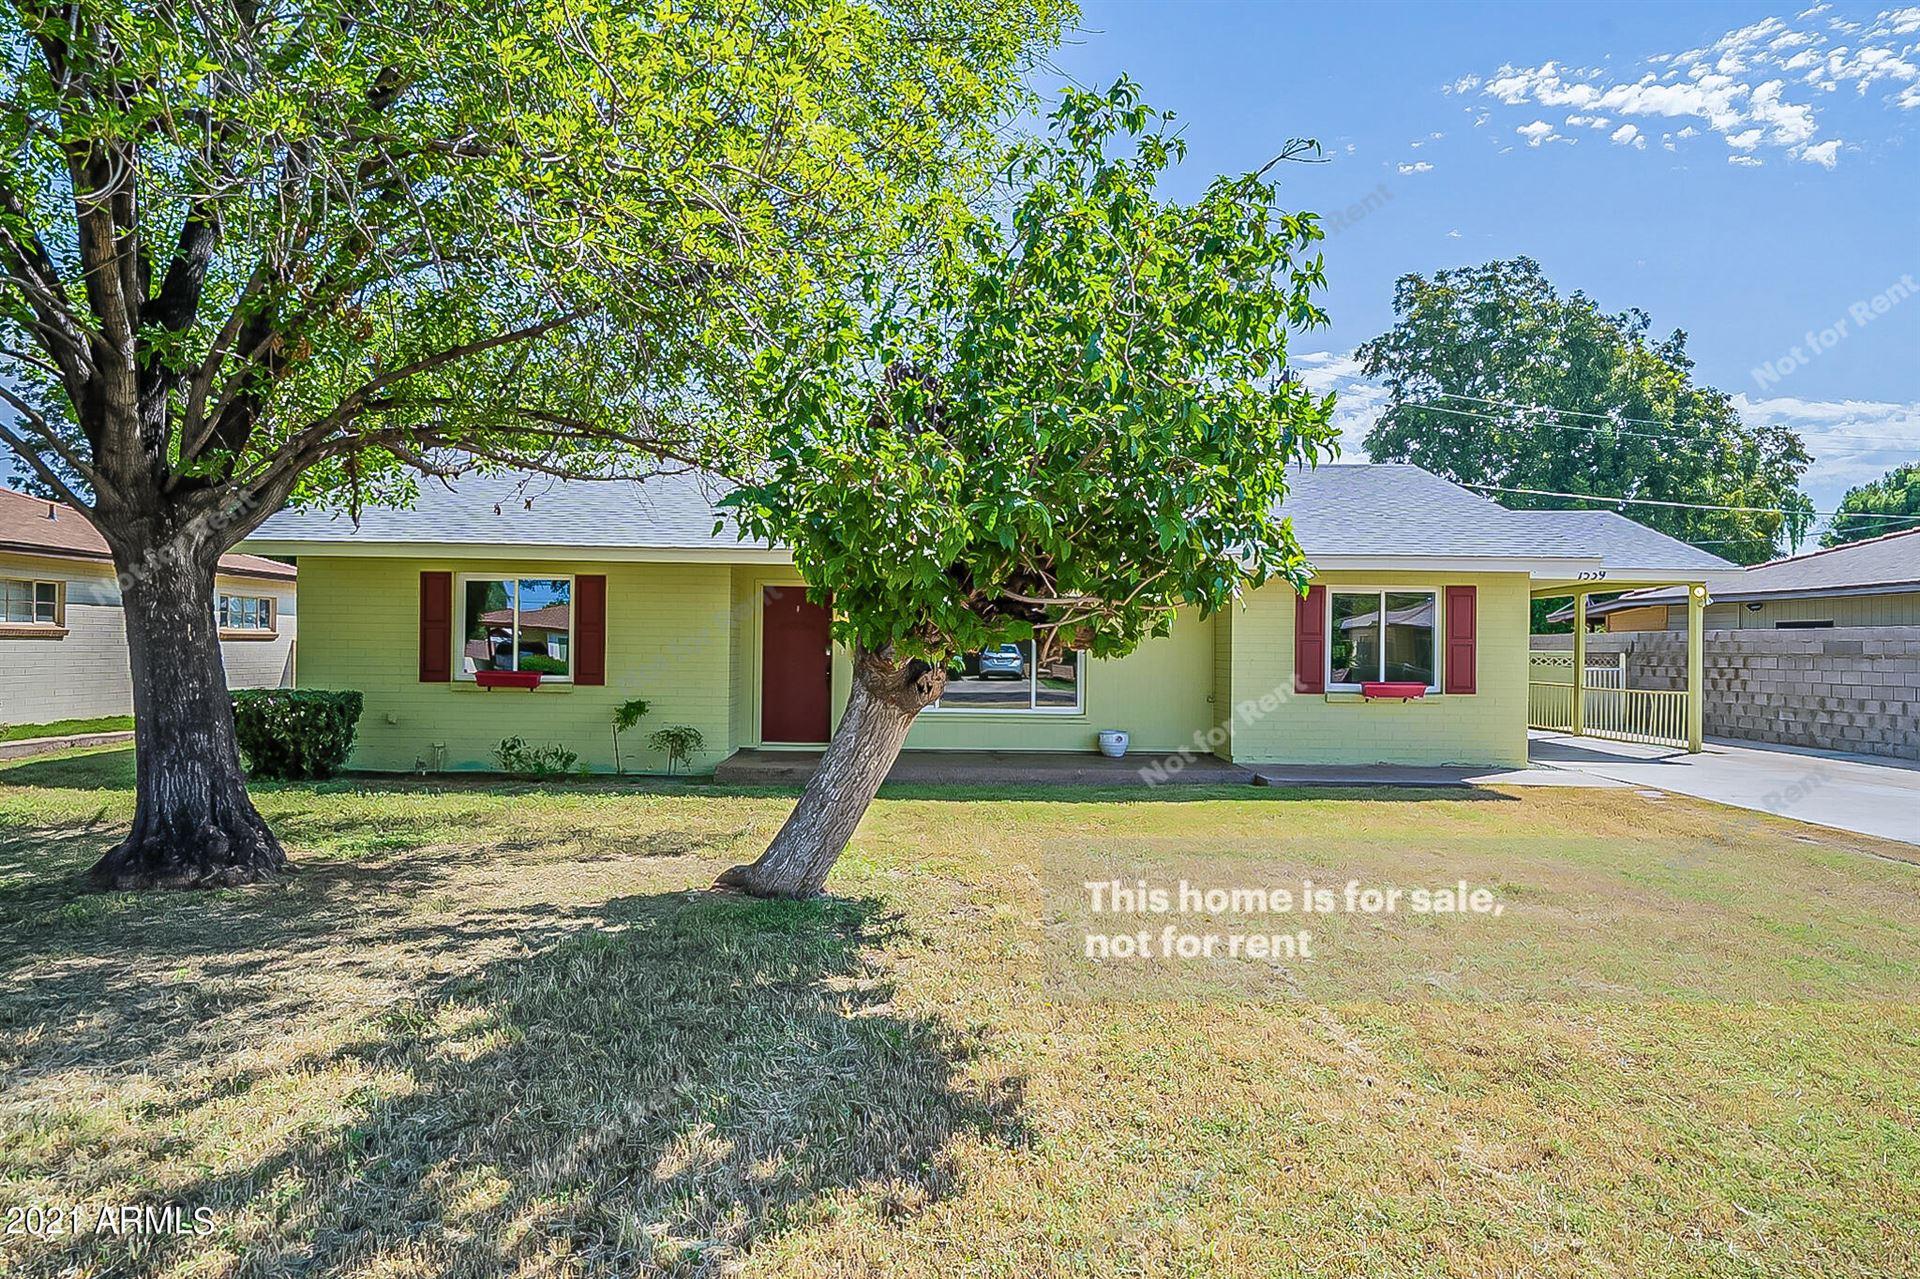 Photo of 7539 N 60TH Avenue, Glendale, AZ 85301 (MLS # 6296352)